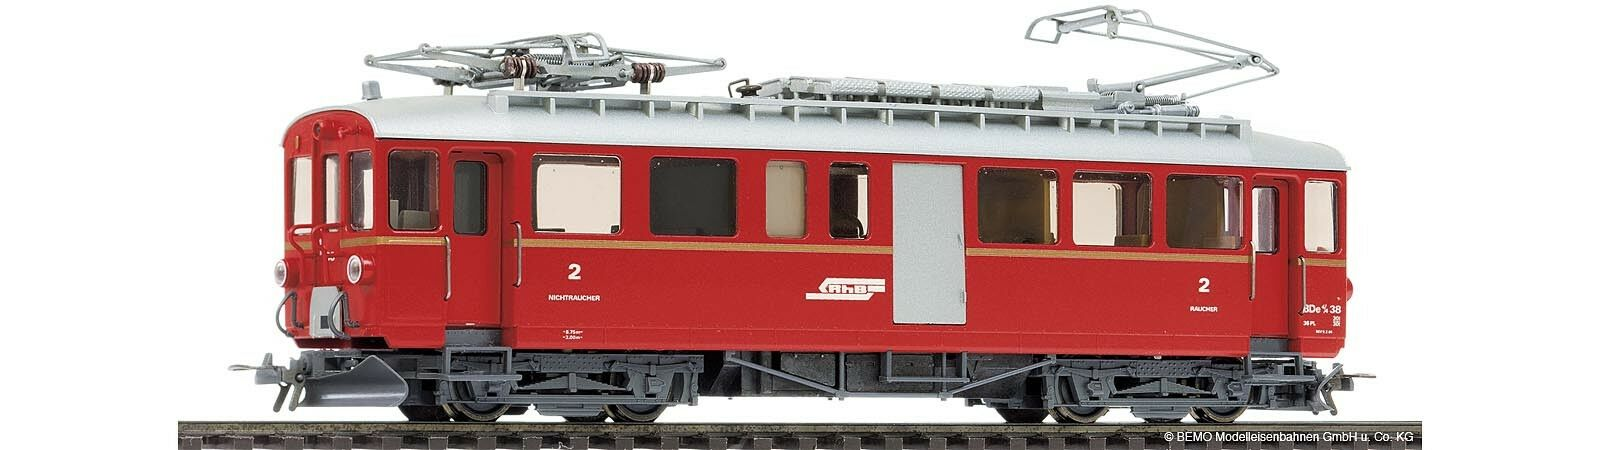 BEMO h0m 1268 148 RHB abde 4 4 38 berninatriebwagen Digital SS merce nuova uvp305 -